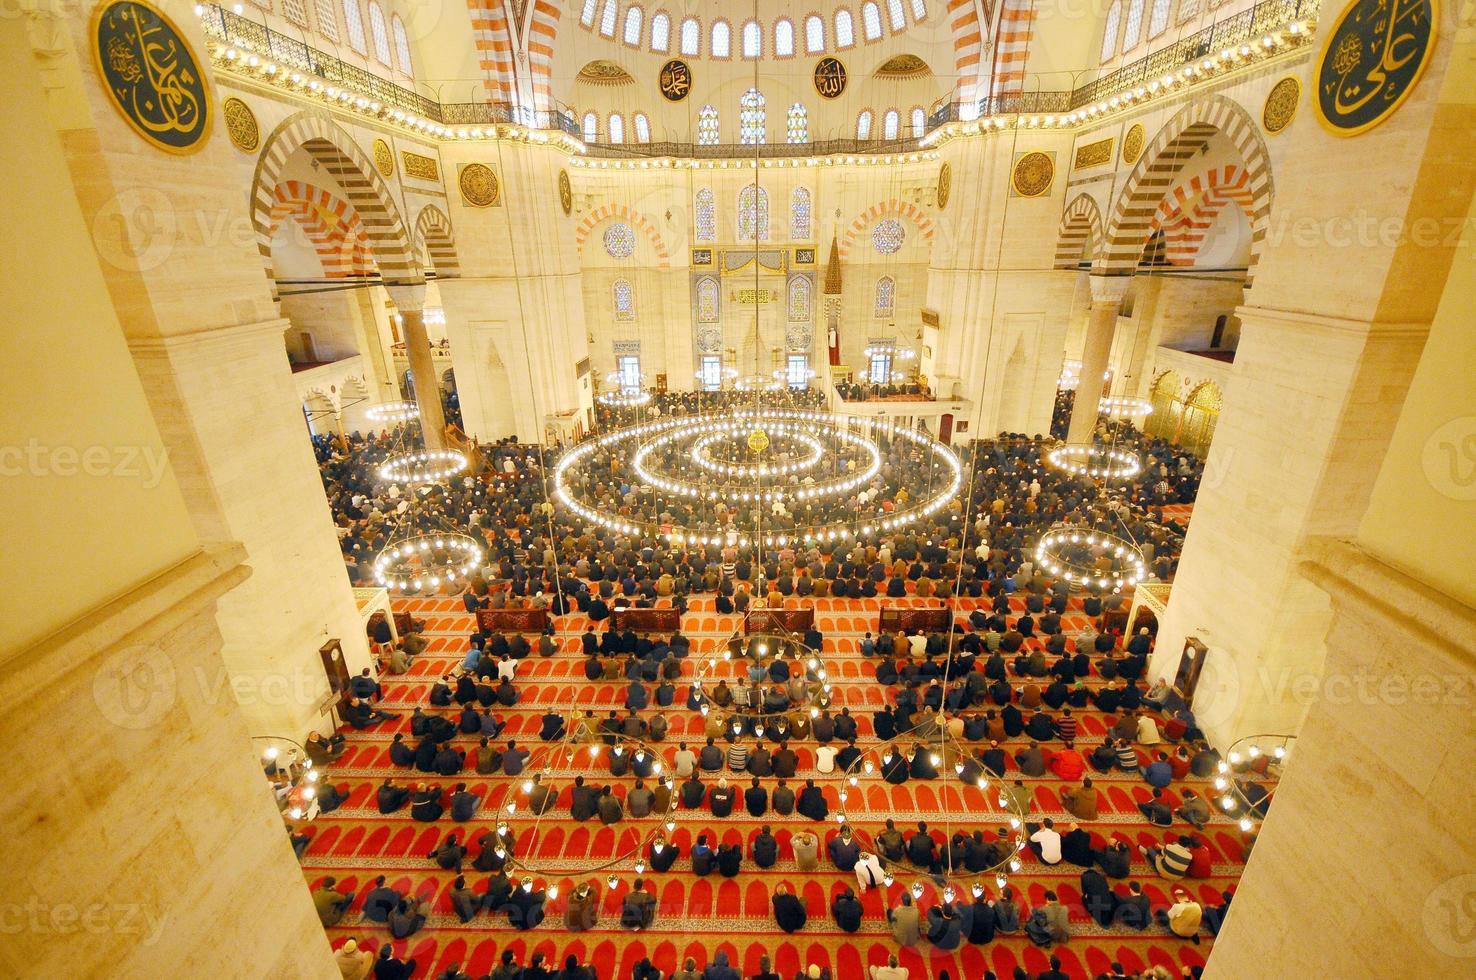 suleymaniye moské, Turkiet foto